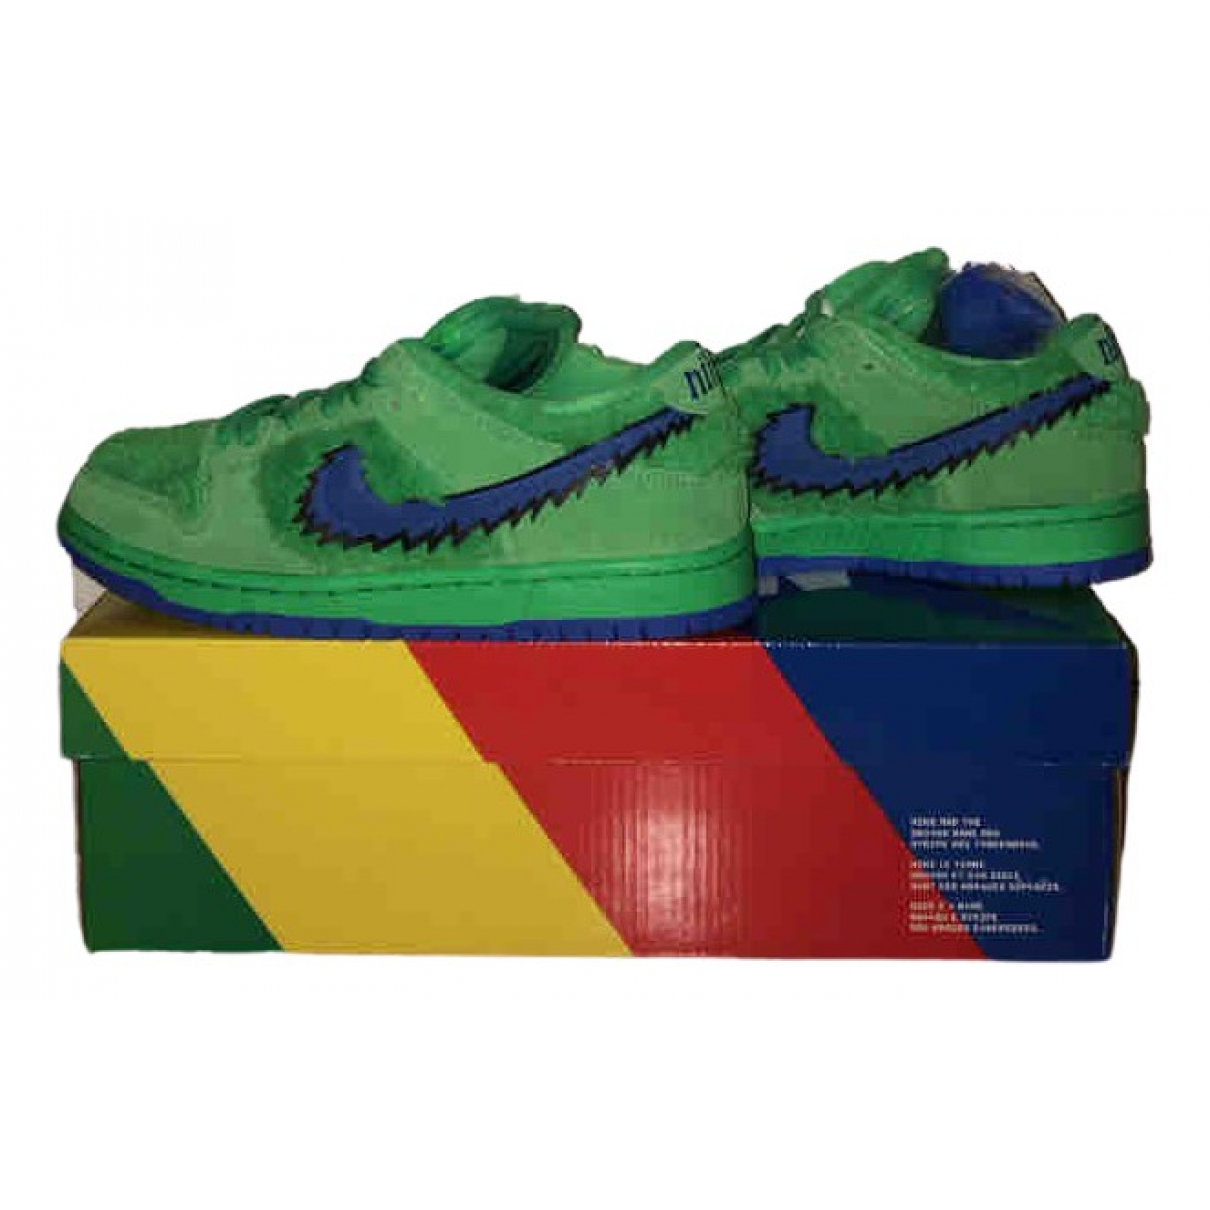 Nike \N Green Trainers for Women 6 US